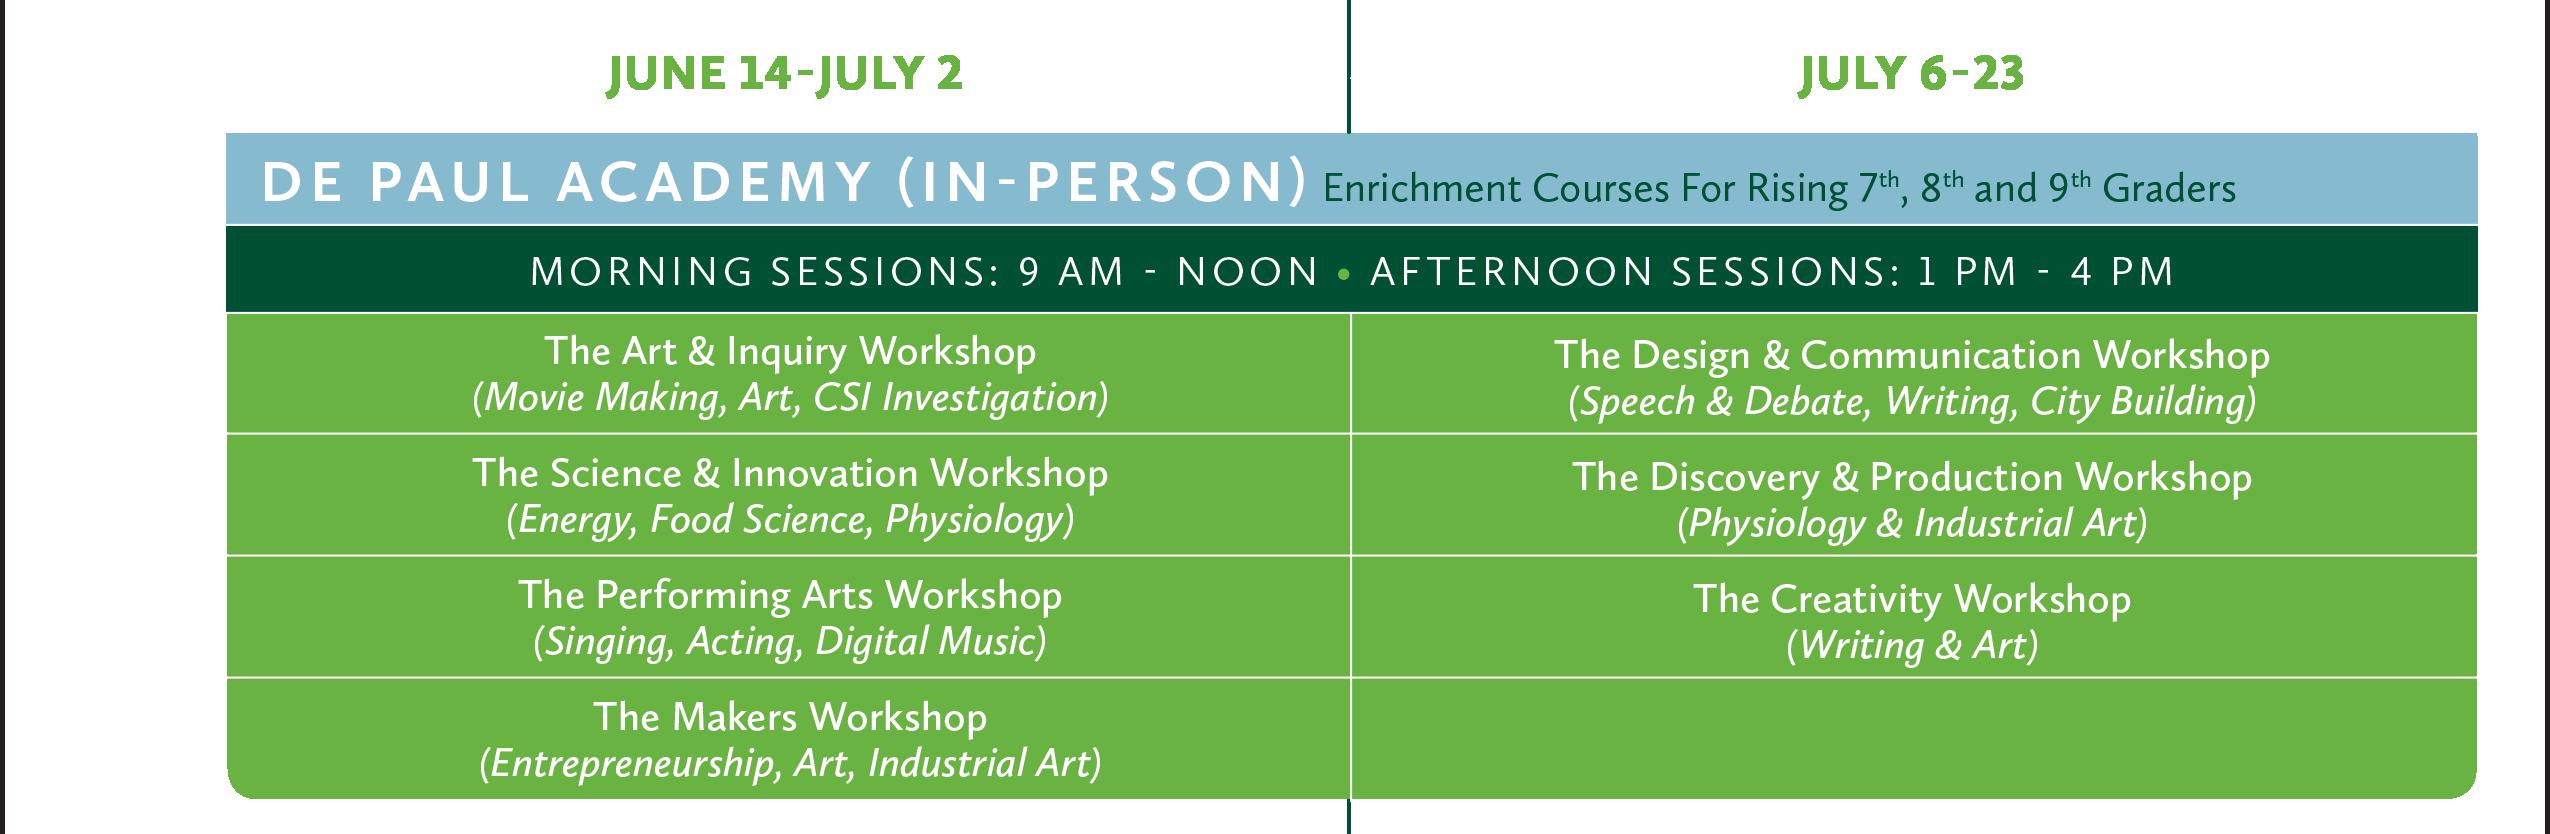 2021 De Paul Academy (In-Person) Calendar